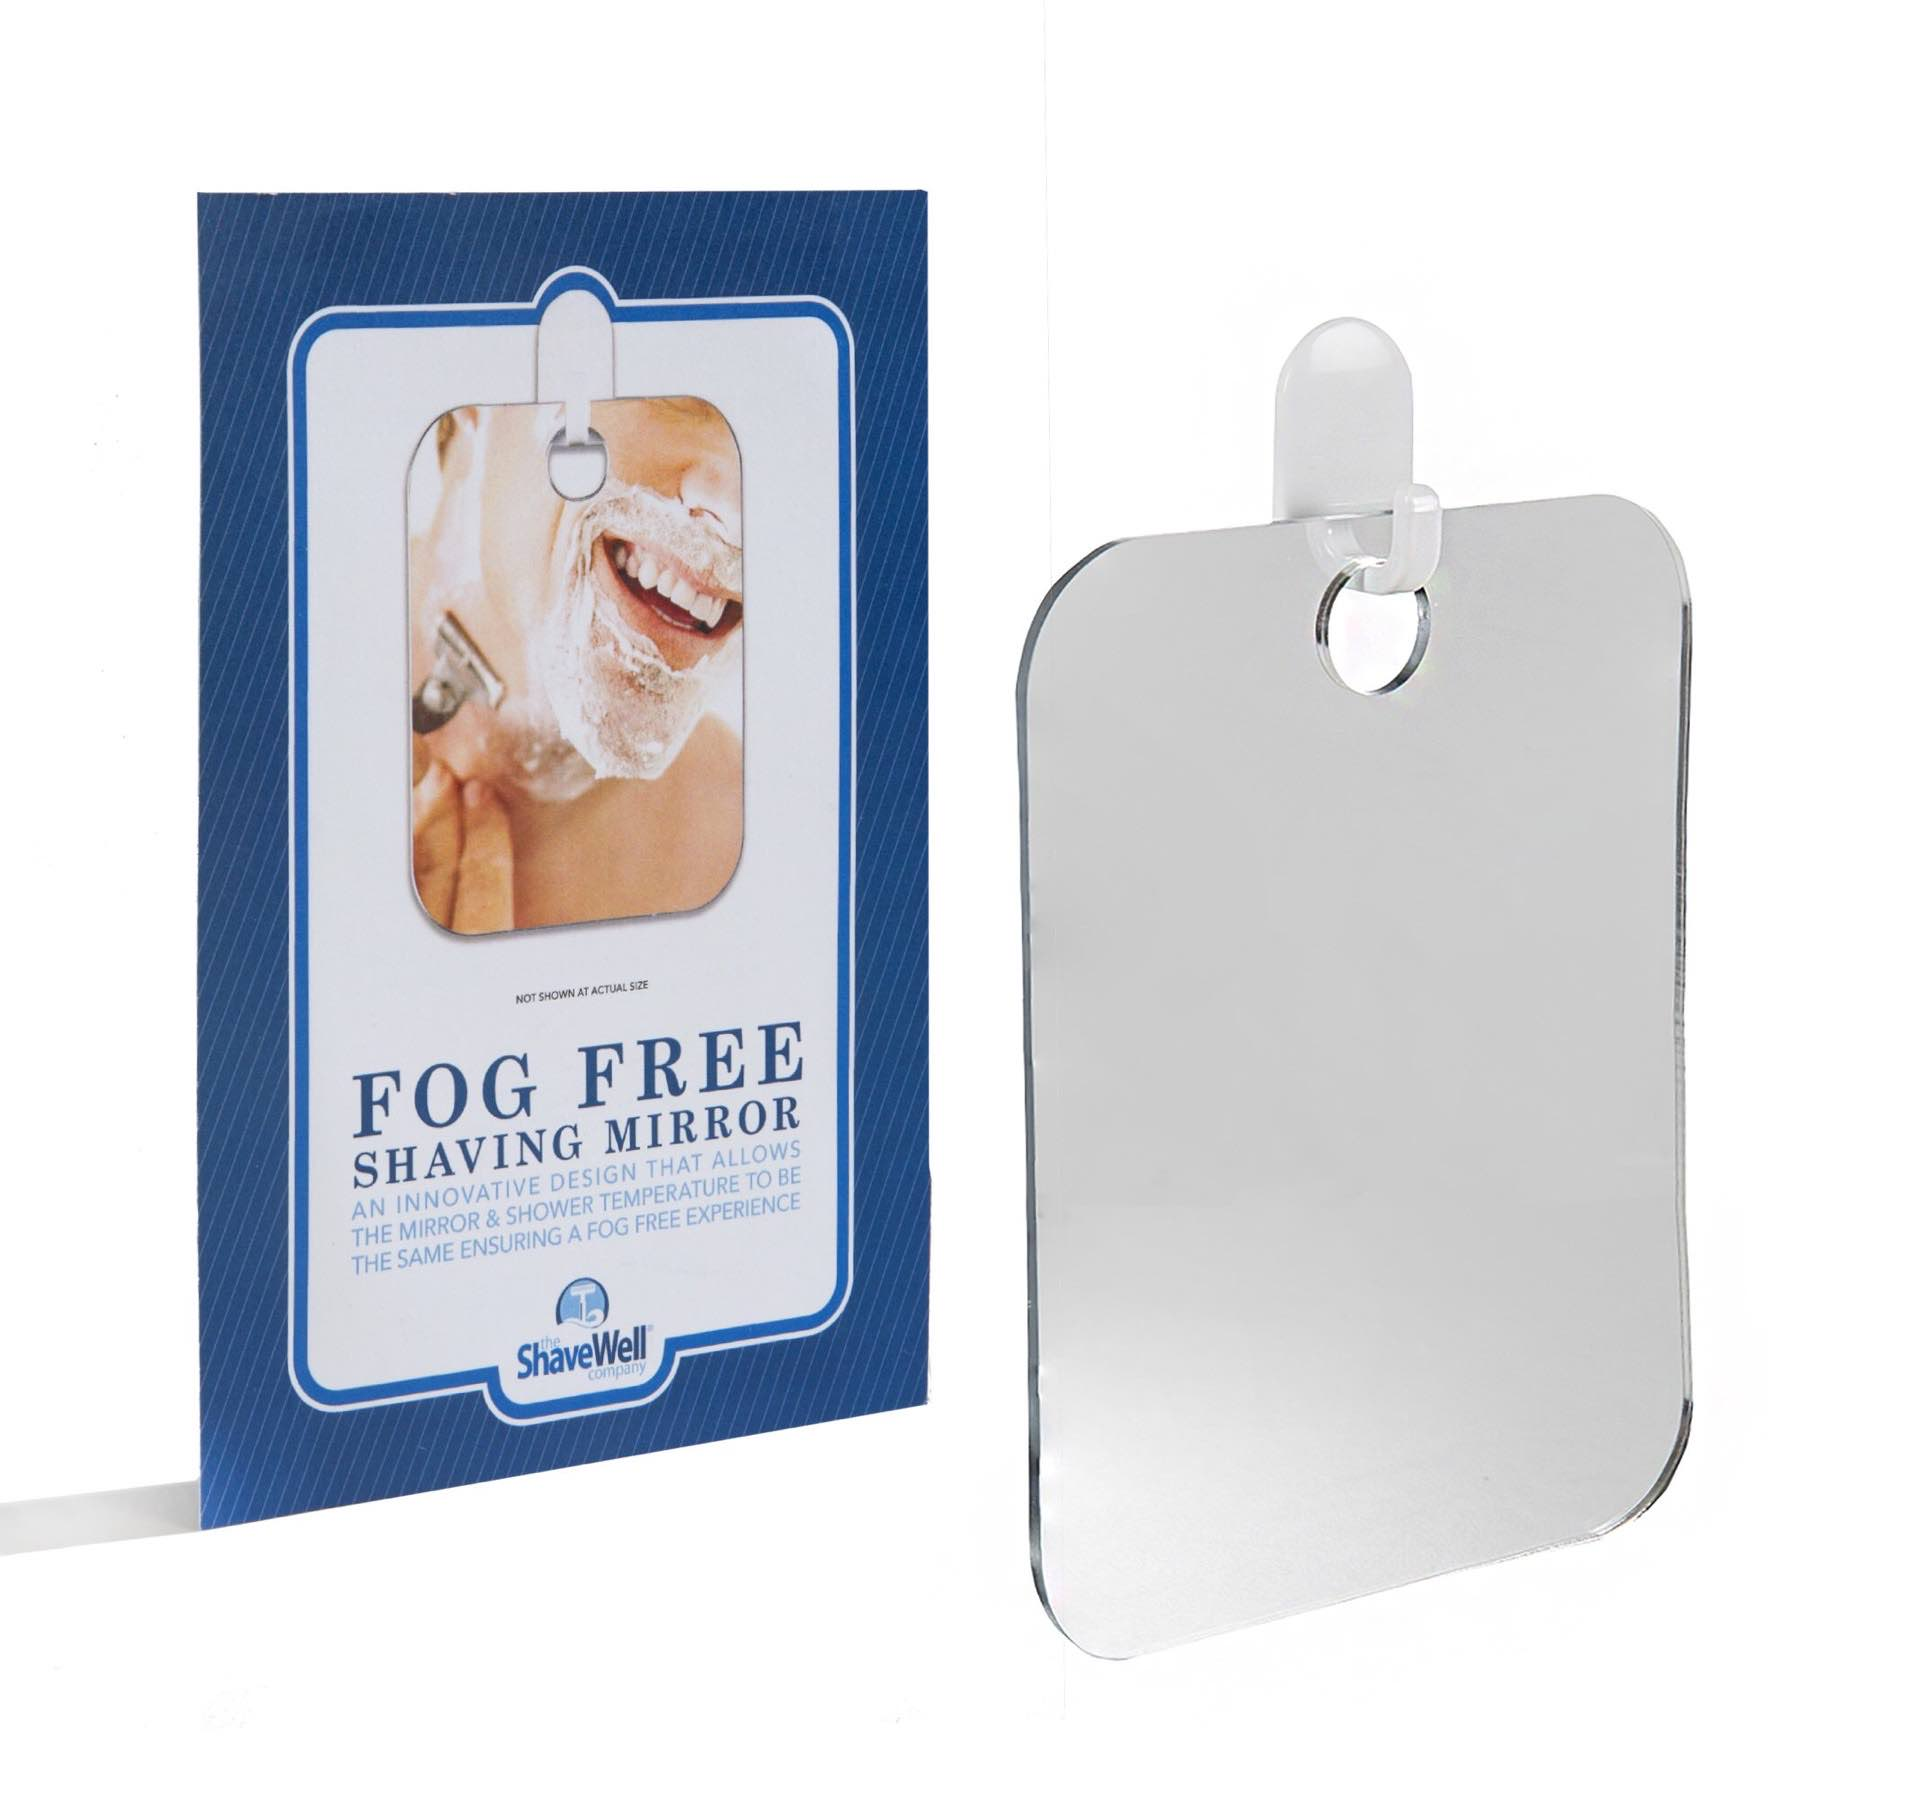 shave-well-anti-fog-shaving-mirror